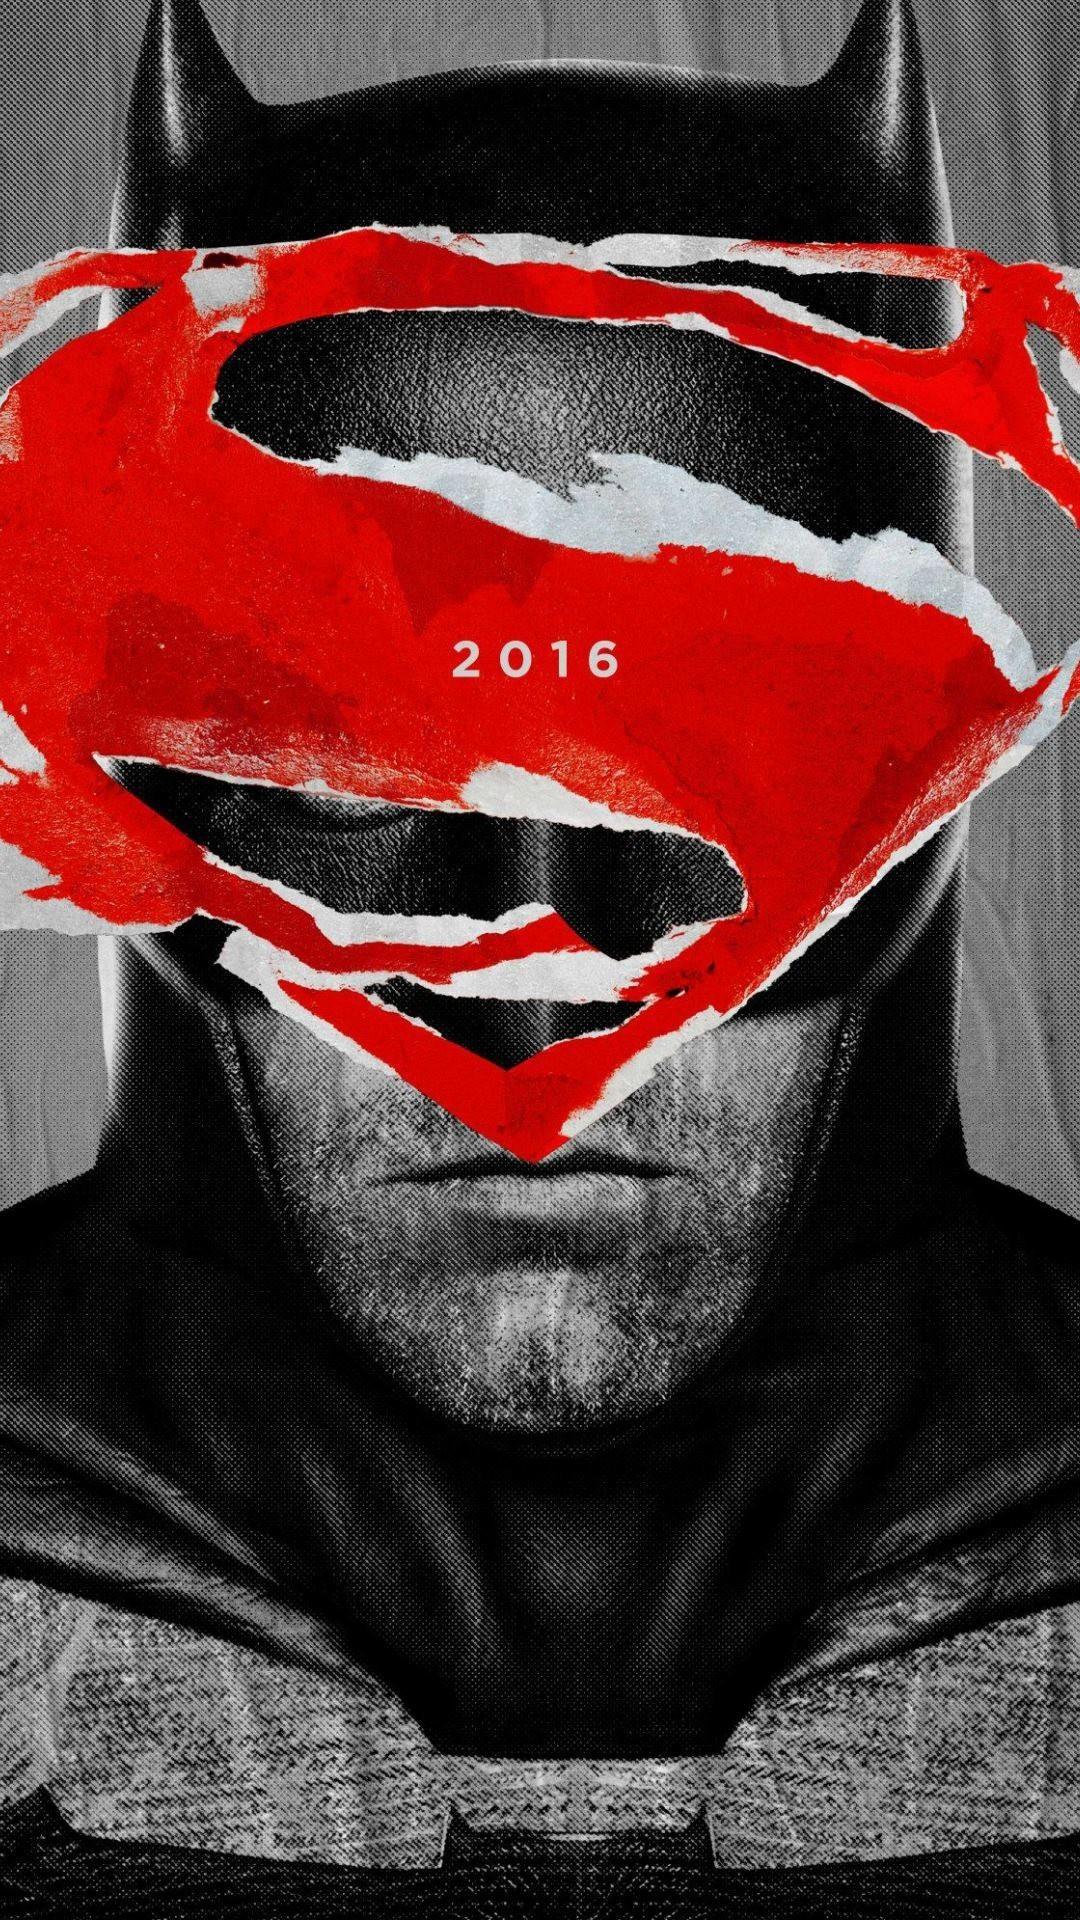 Batman face with superman logo wallpaper background.